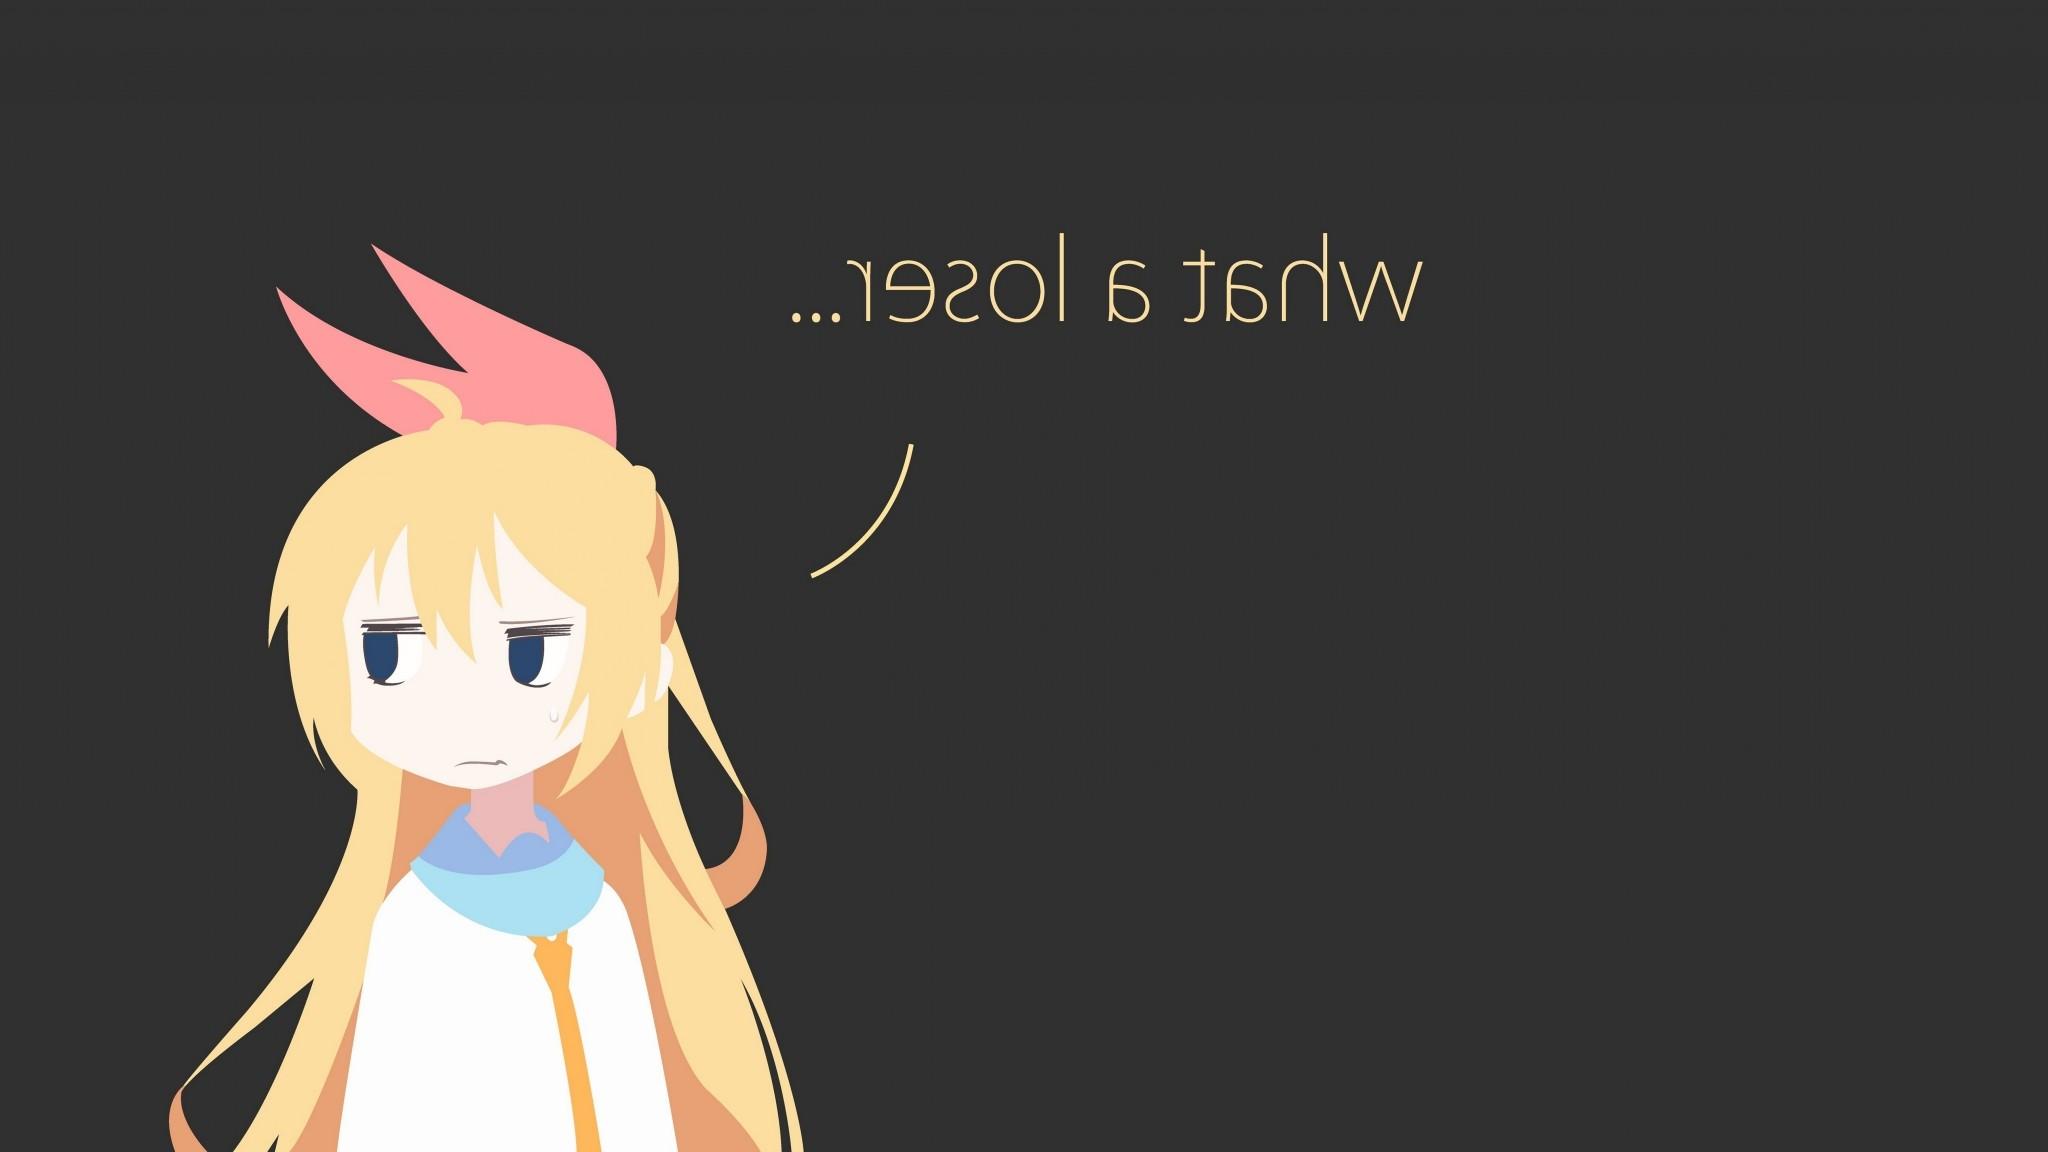 Anime Girl 1080p Wallpaper Sad Anime Wallpaper 64 Images